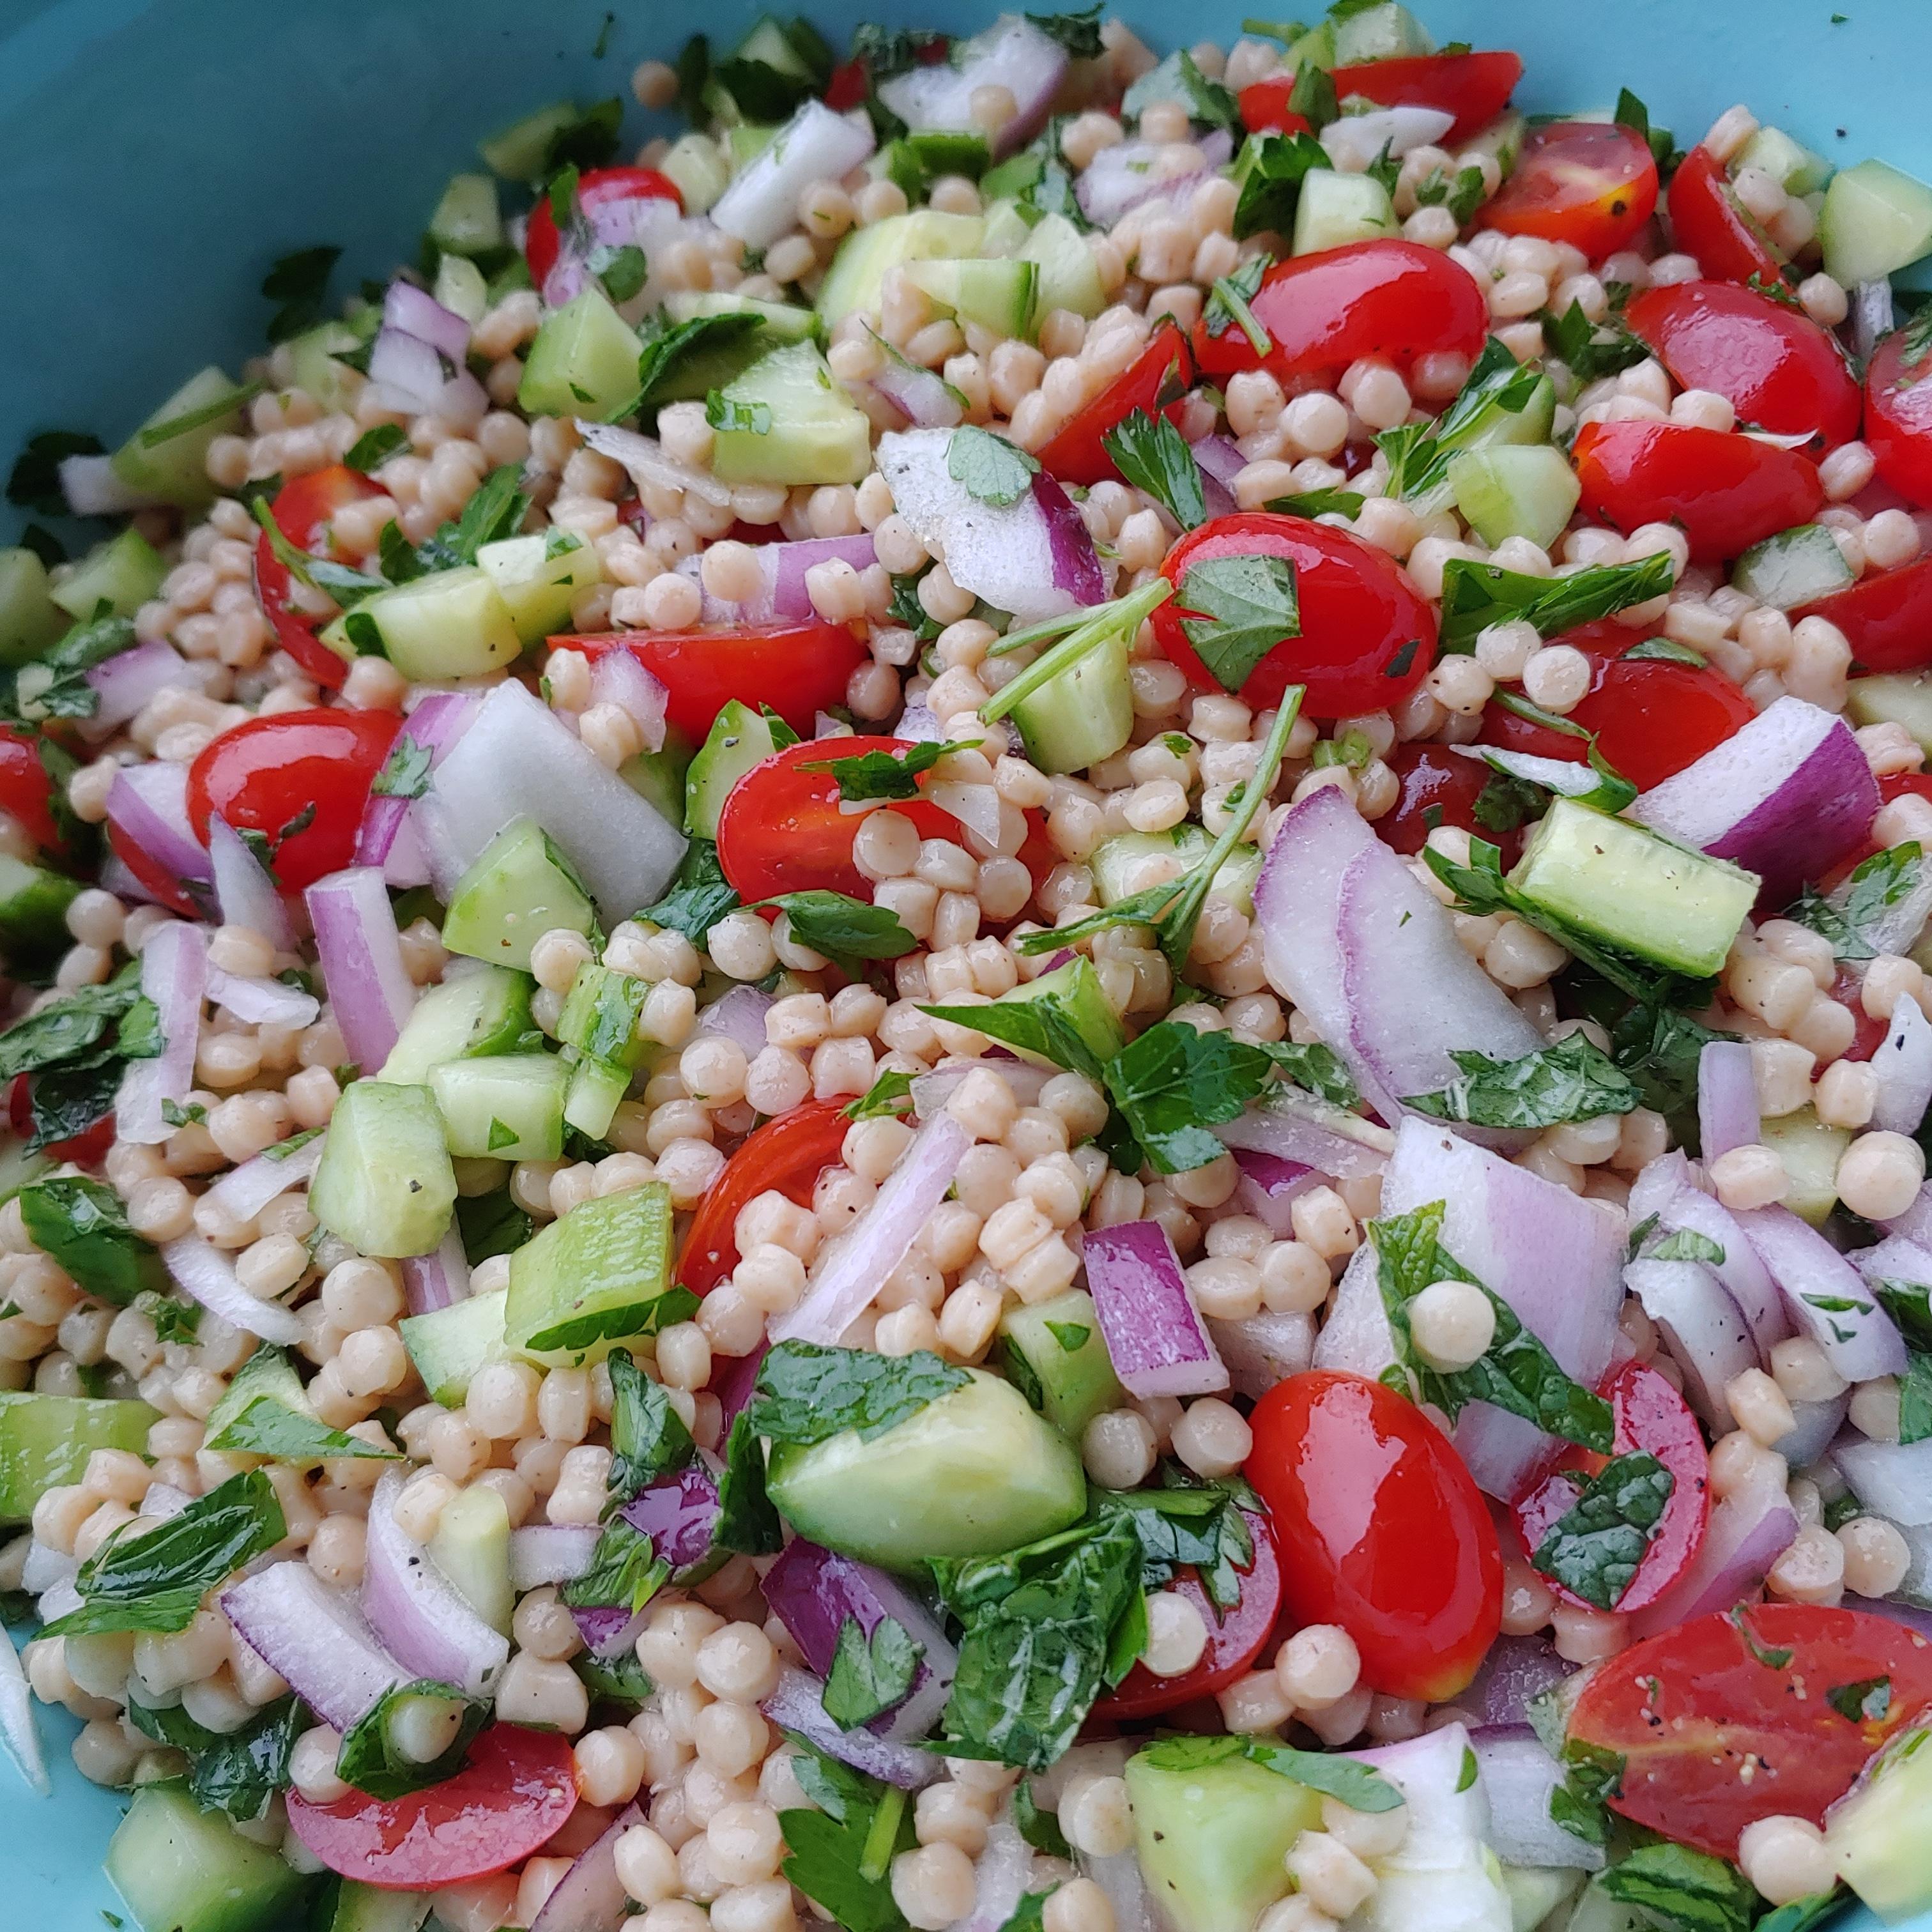 Whole Wheat Couscous Tabbouleh Tanna Dean